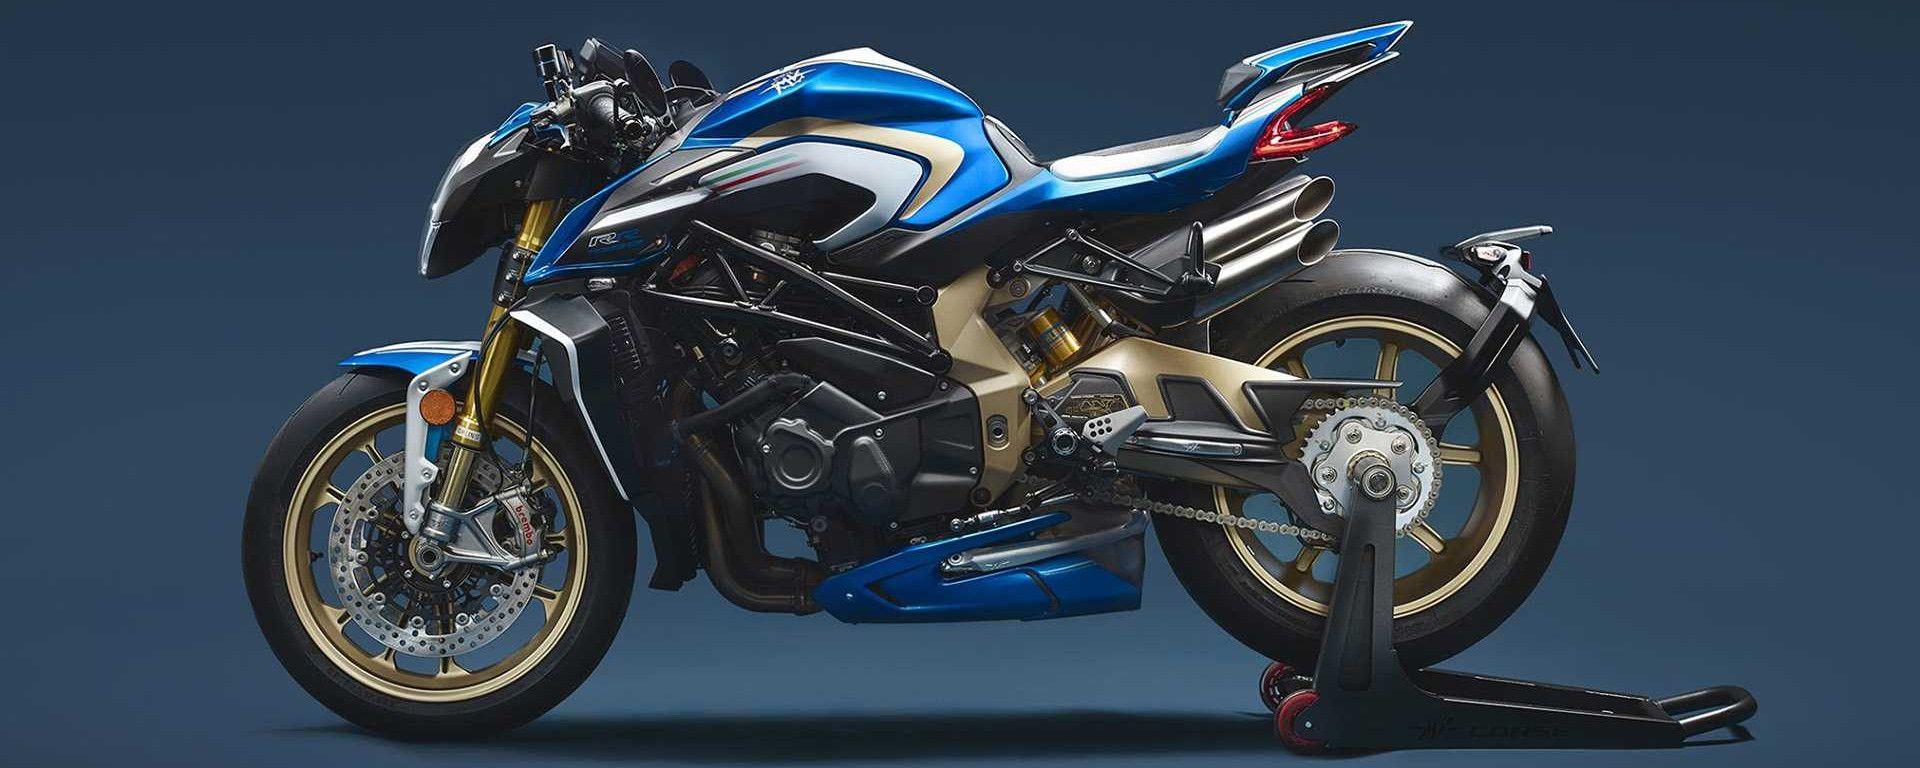 MV Agusta Brutale 1000 RR Serie Oro White and Blue M.L.